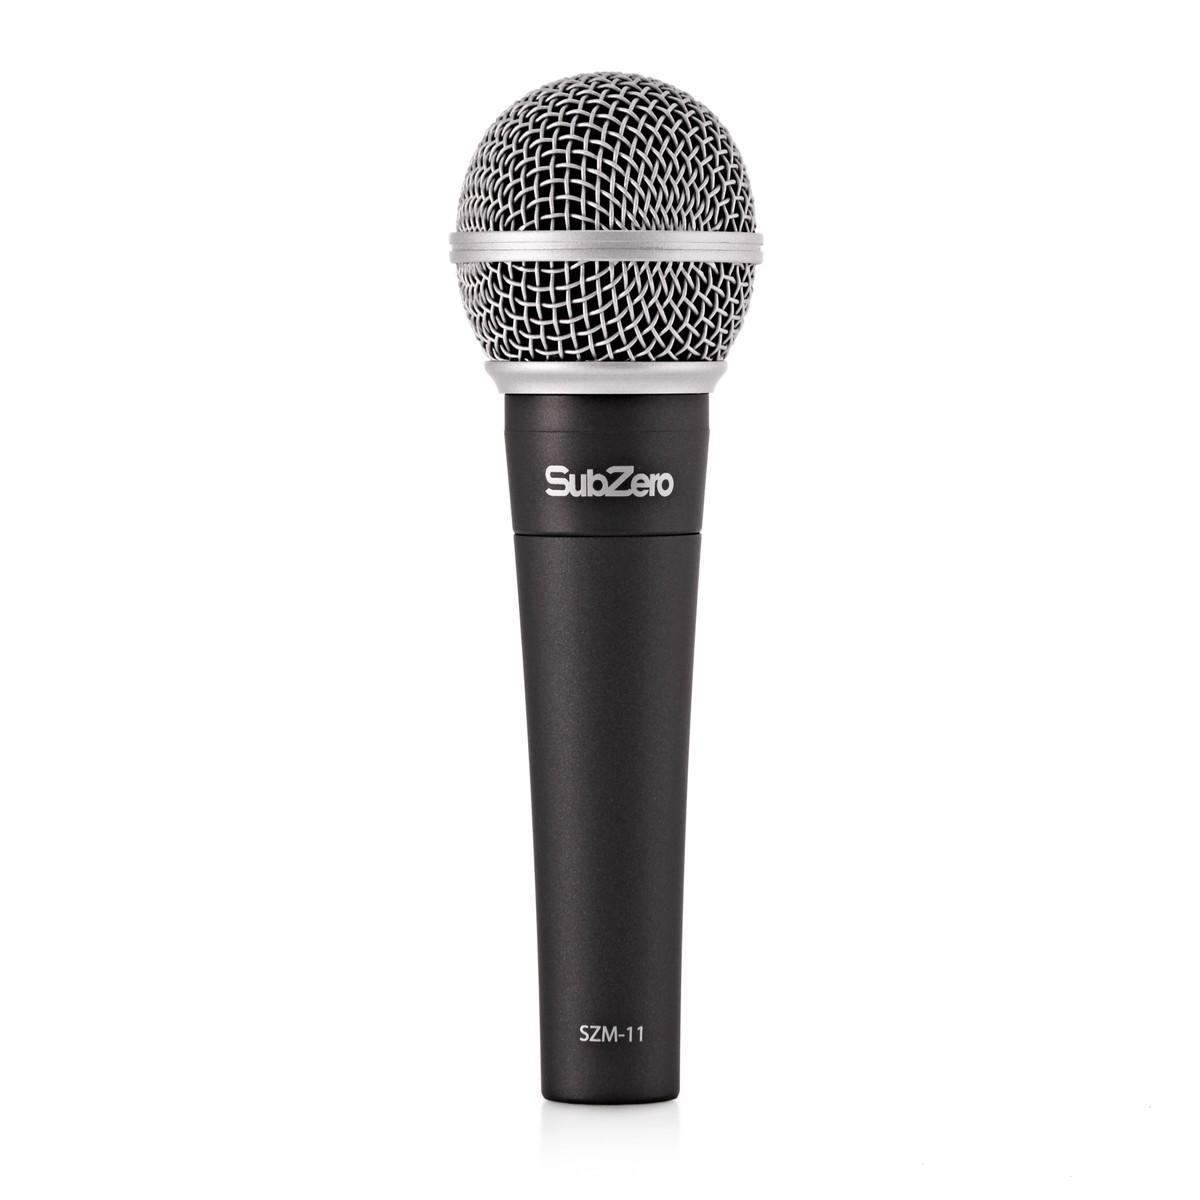 subzero szm 11 dynamic vocal microphone b stock at gear4music. Black Bedroom Furniture Sets. Home Design Ideas